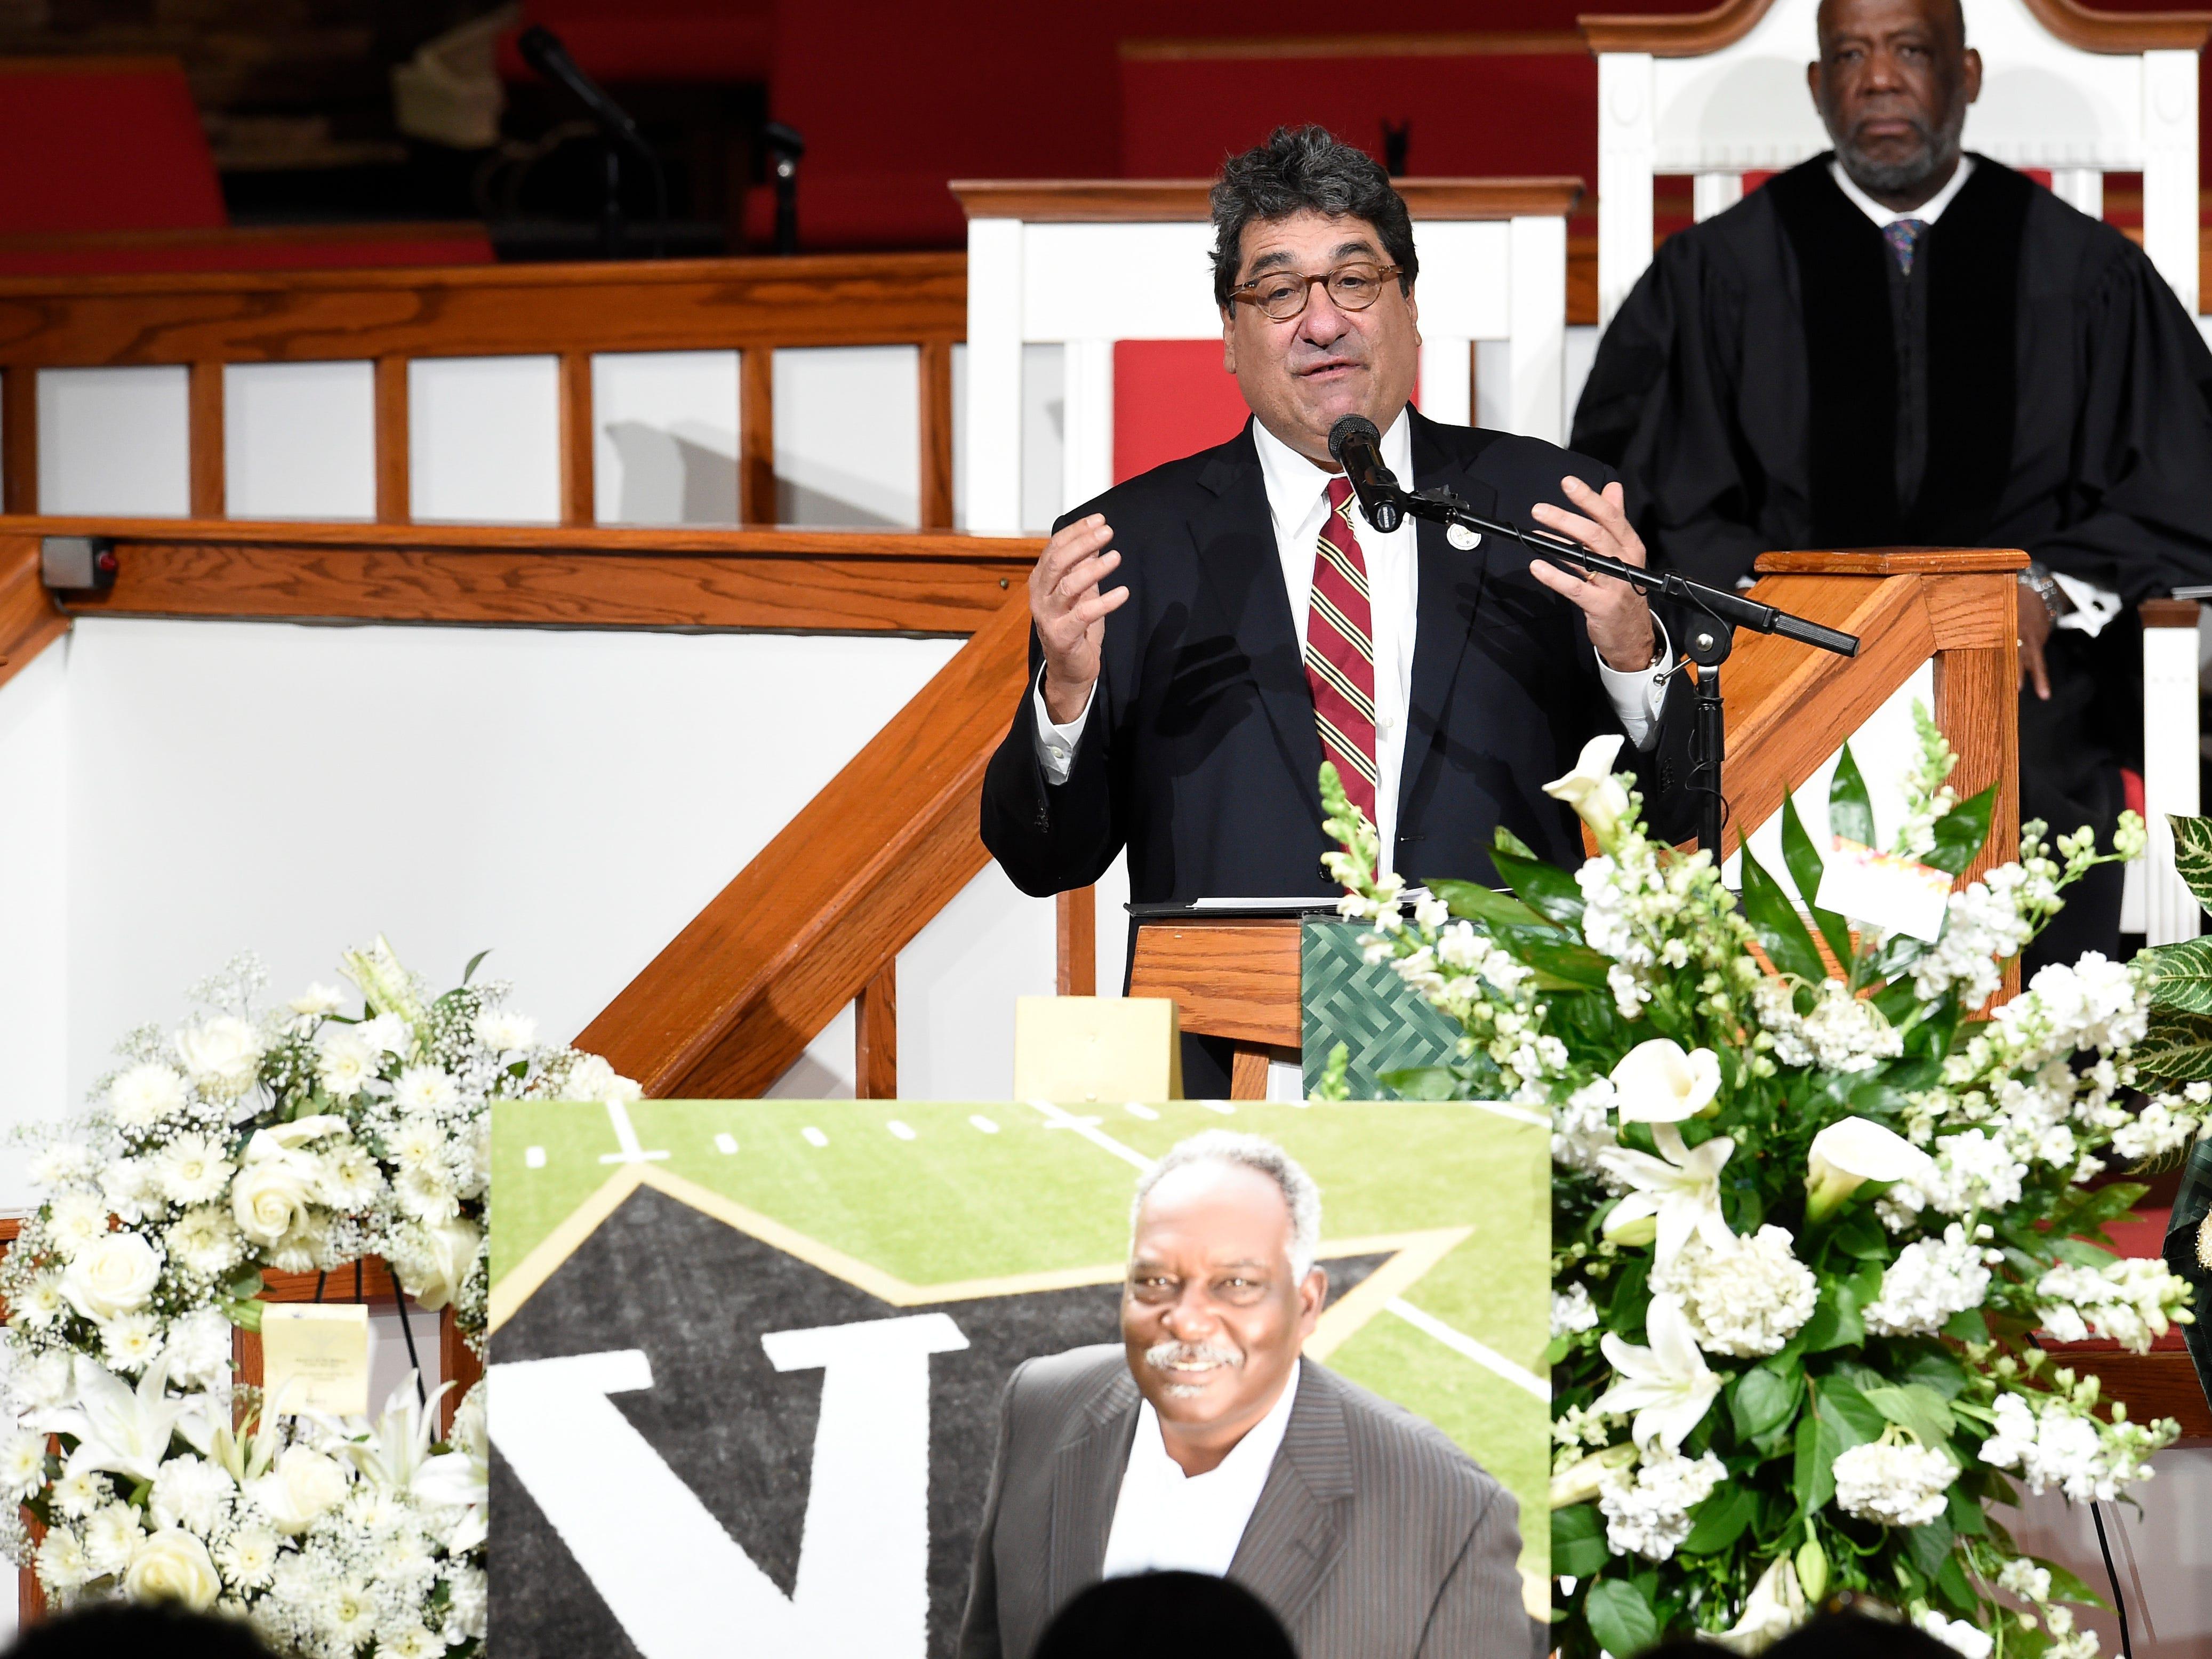 Vanderbilt Chancellor Nicholas Zeppos speaks at the funeral for former Vanderbilt athletics director David WIlliams Friday, Feb. 15, 2019, at The Temple Church in Nashville, Tenn.